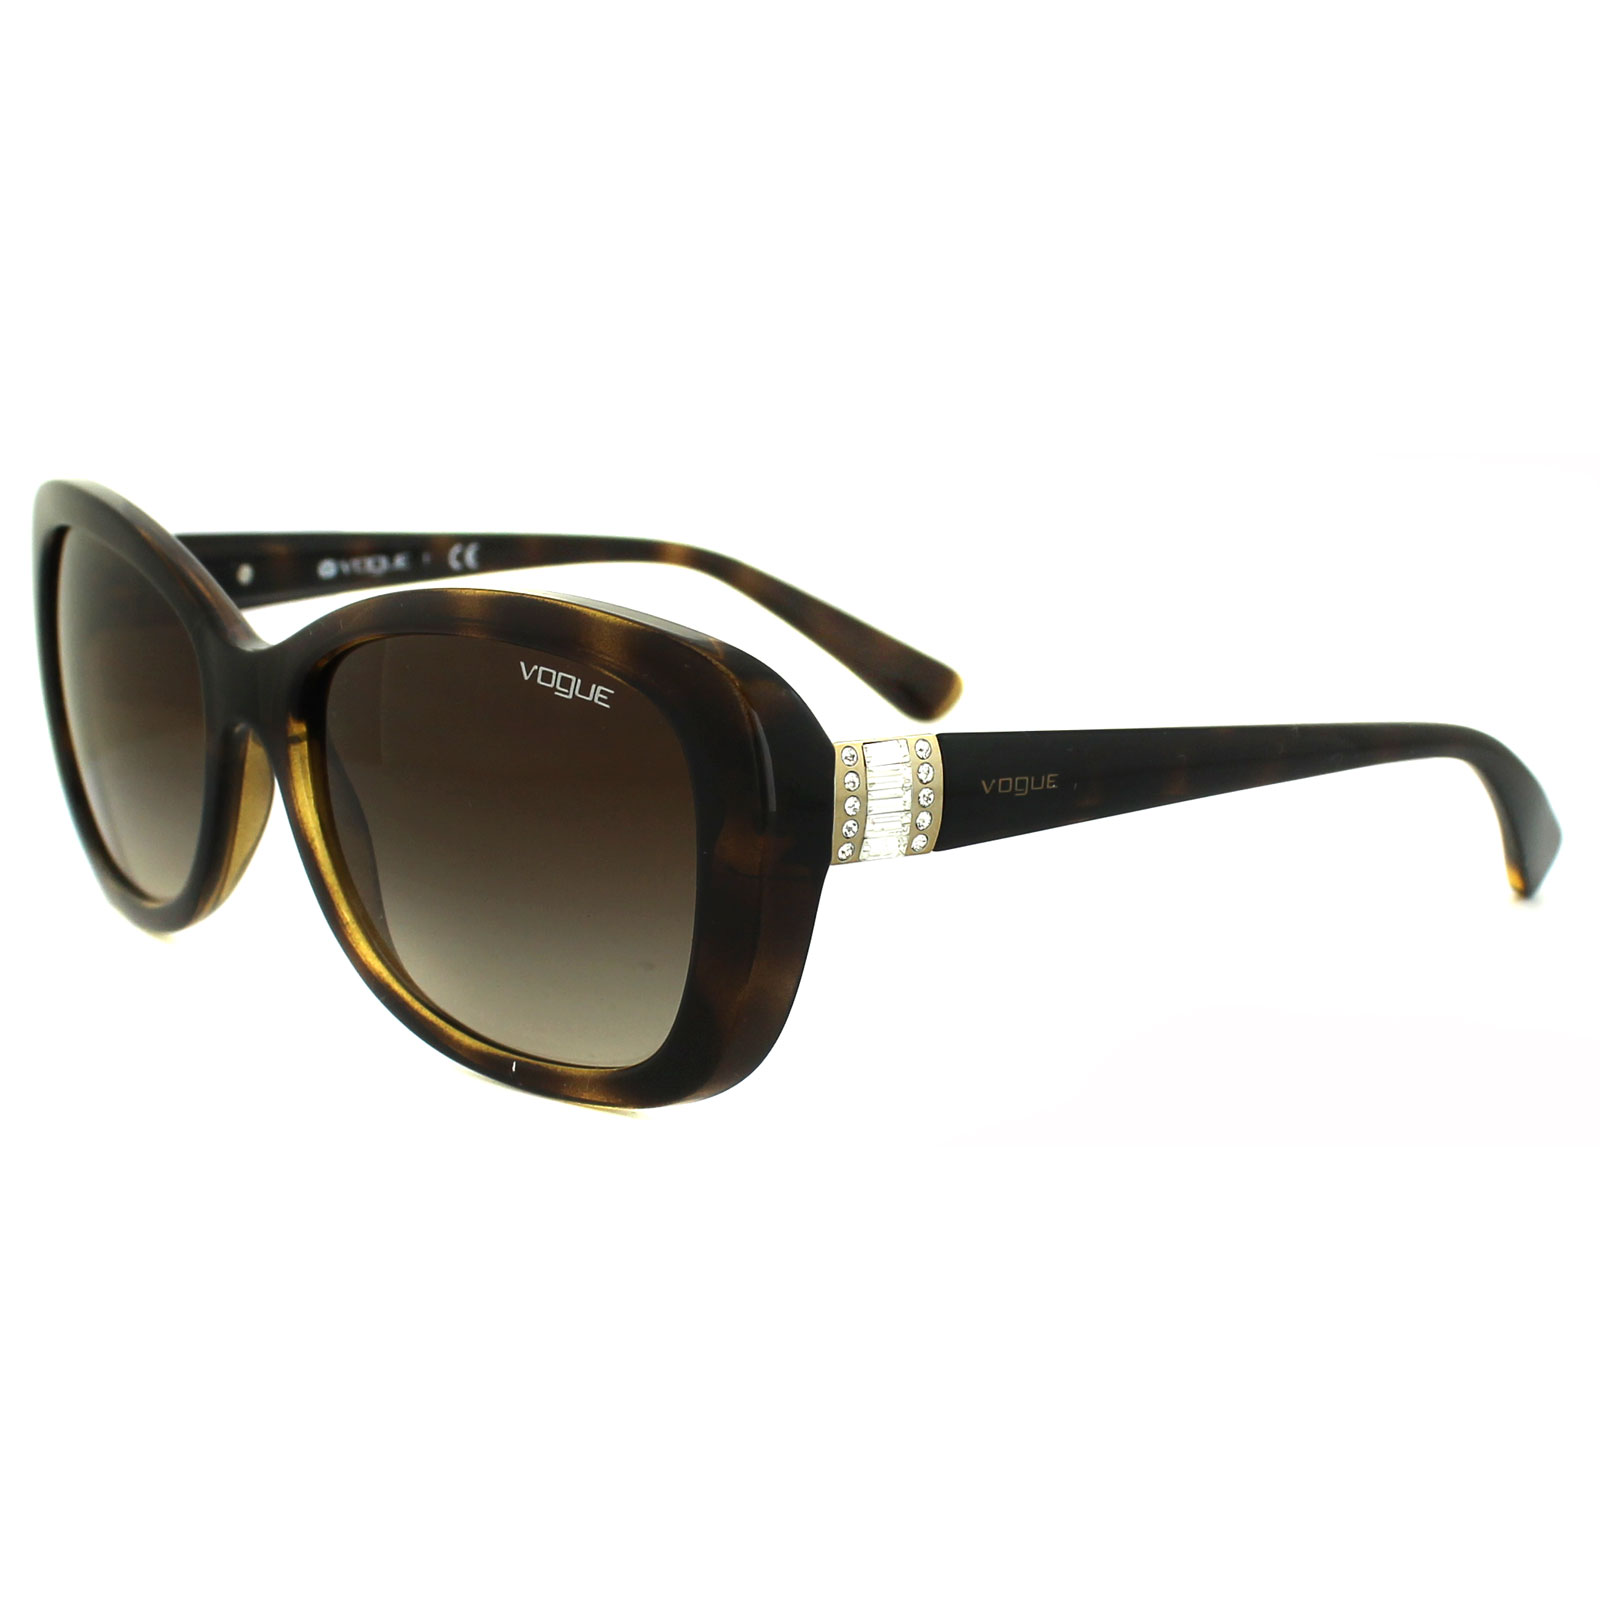 Vogue Sunglasses 2943sb W65613 Dark Havana Brown Gradient